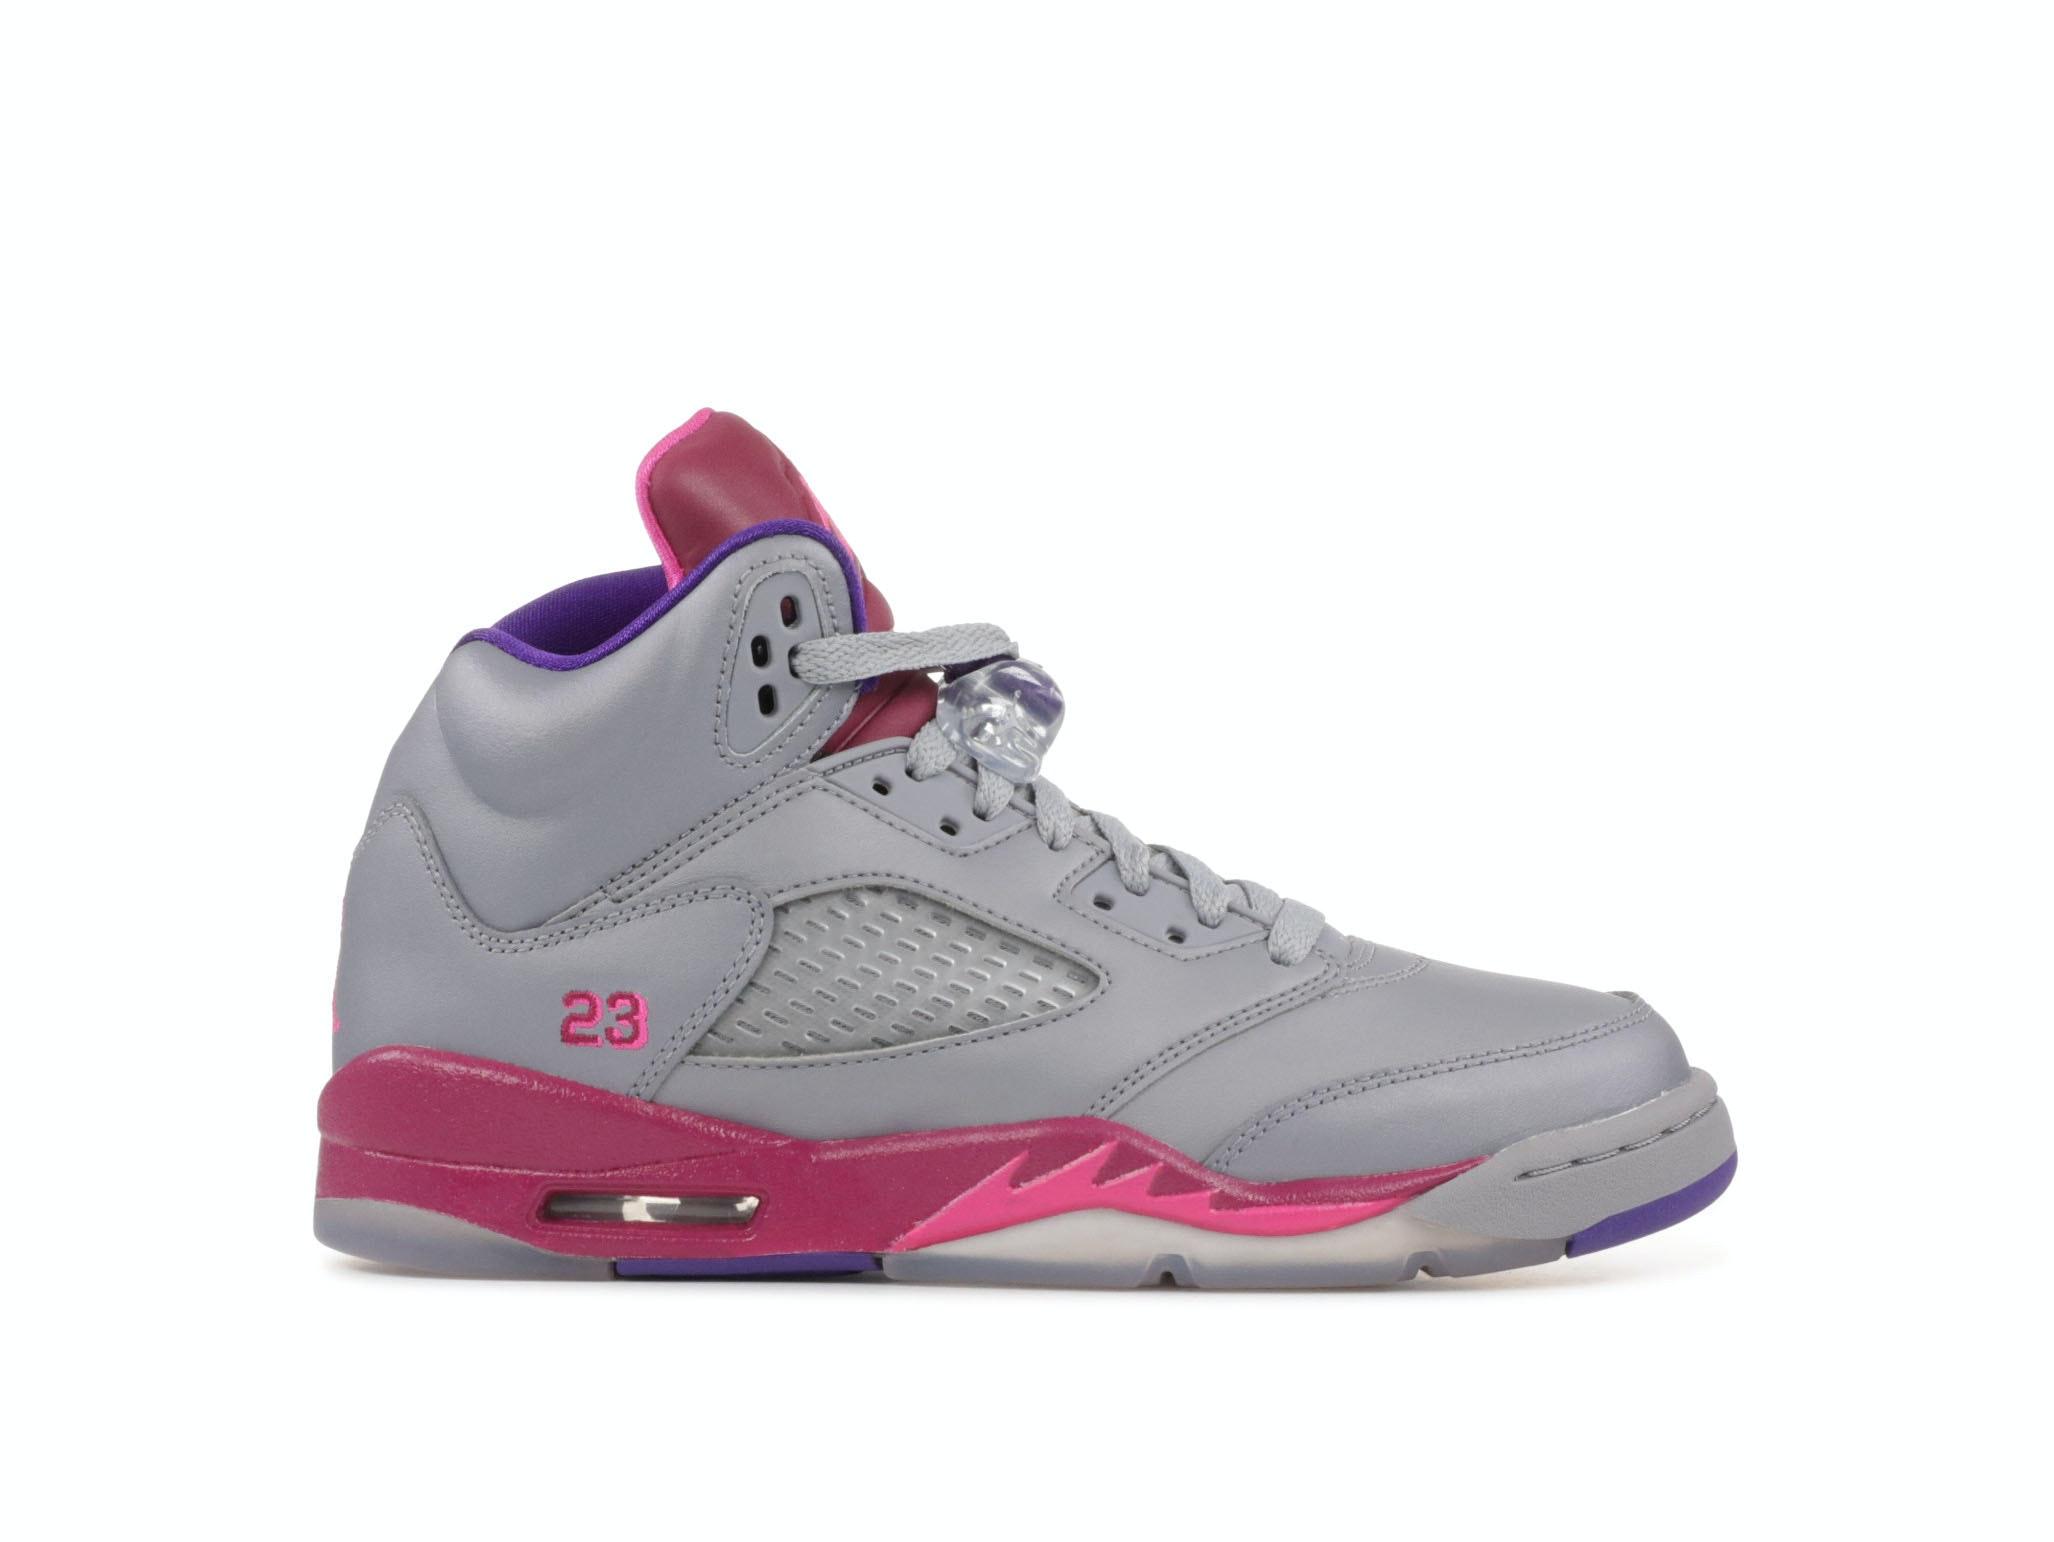 brand new f75fe ccef4 Air Jordan 5 Retro GS Cement Grey Pink